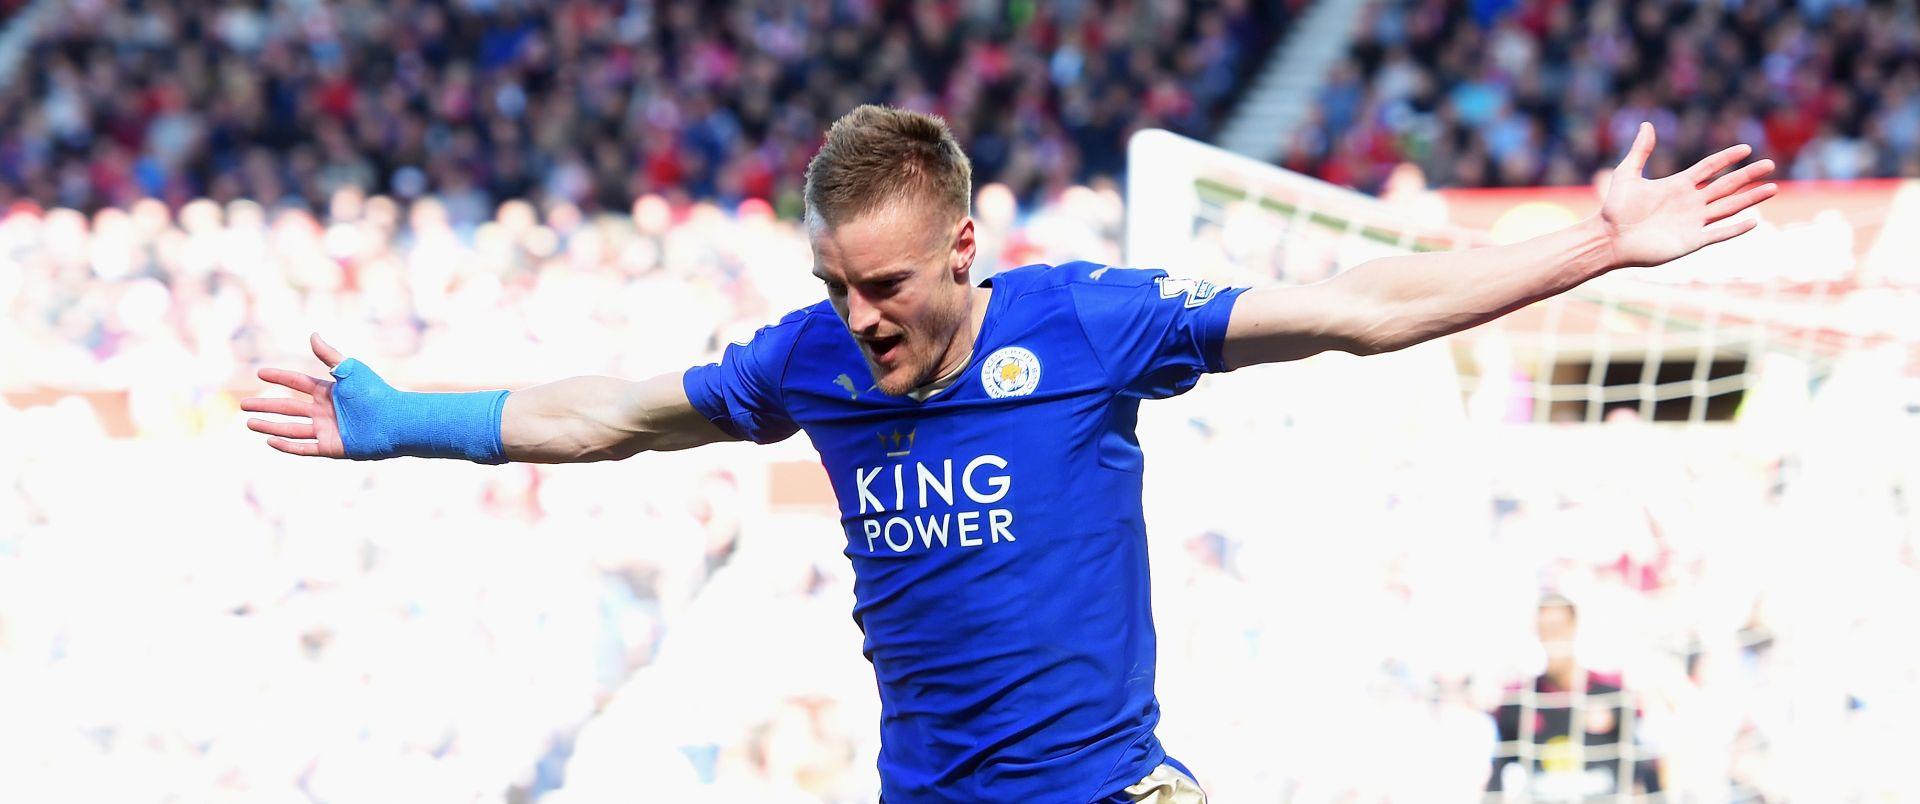 PRVAK 'RAZBIO' CITY Hat-trick Jamieja Vardyja u velikom slavlju Leicestera